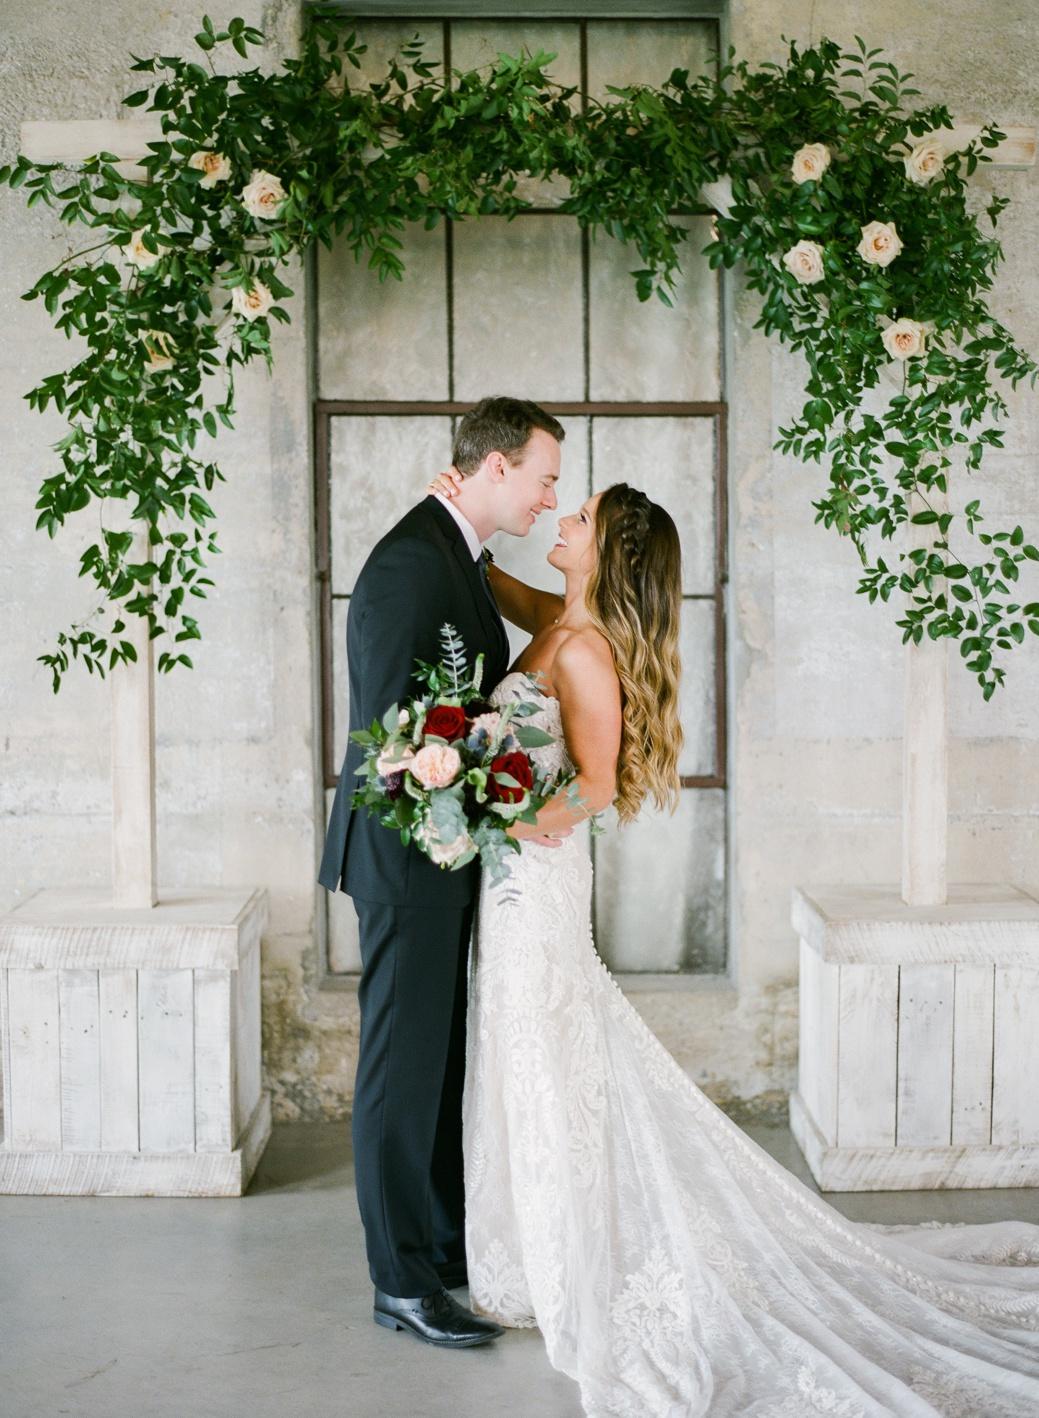 Olde-Dobbin-Station-Wedding-Photographer-Kelly-24